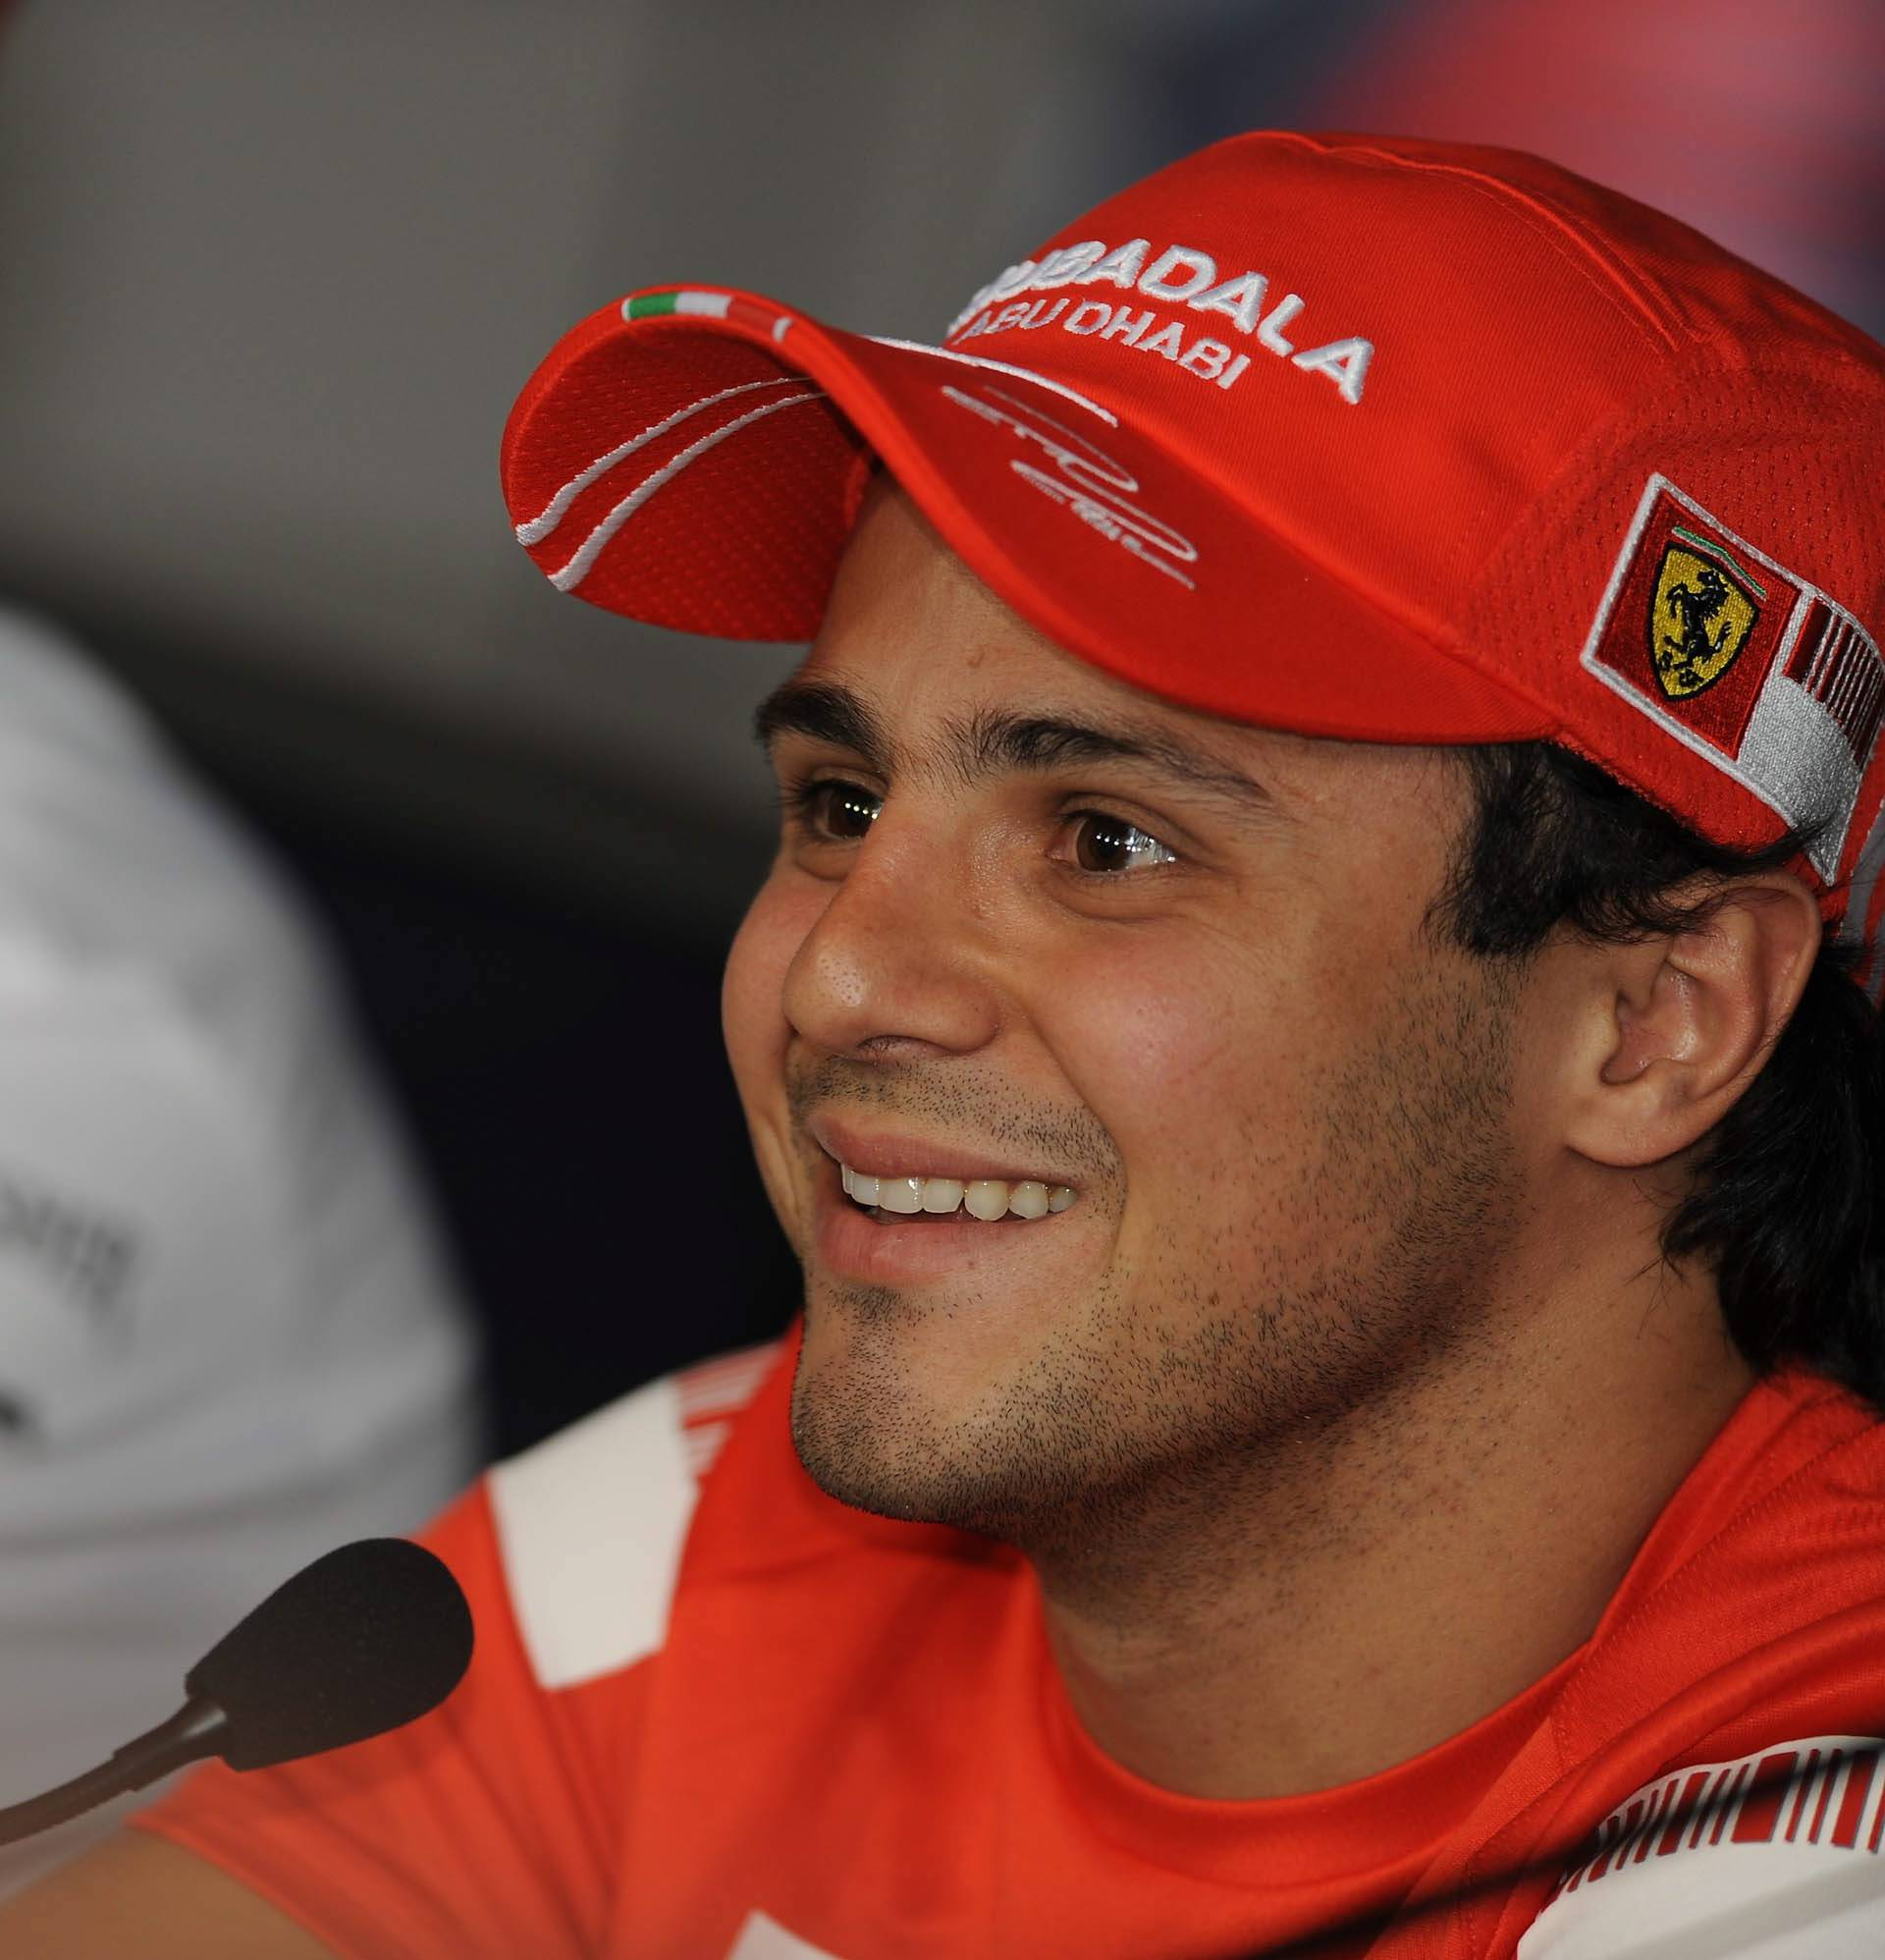 Formula 1 GP of Italy, Monza 12.-14. September 2008